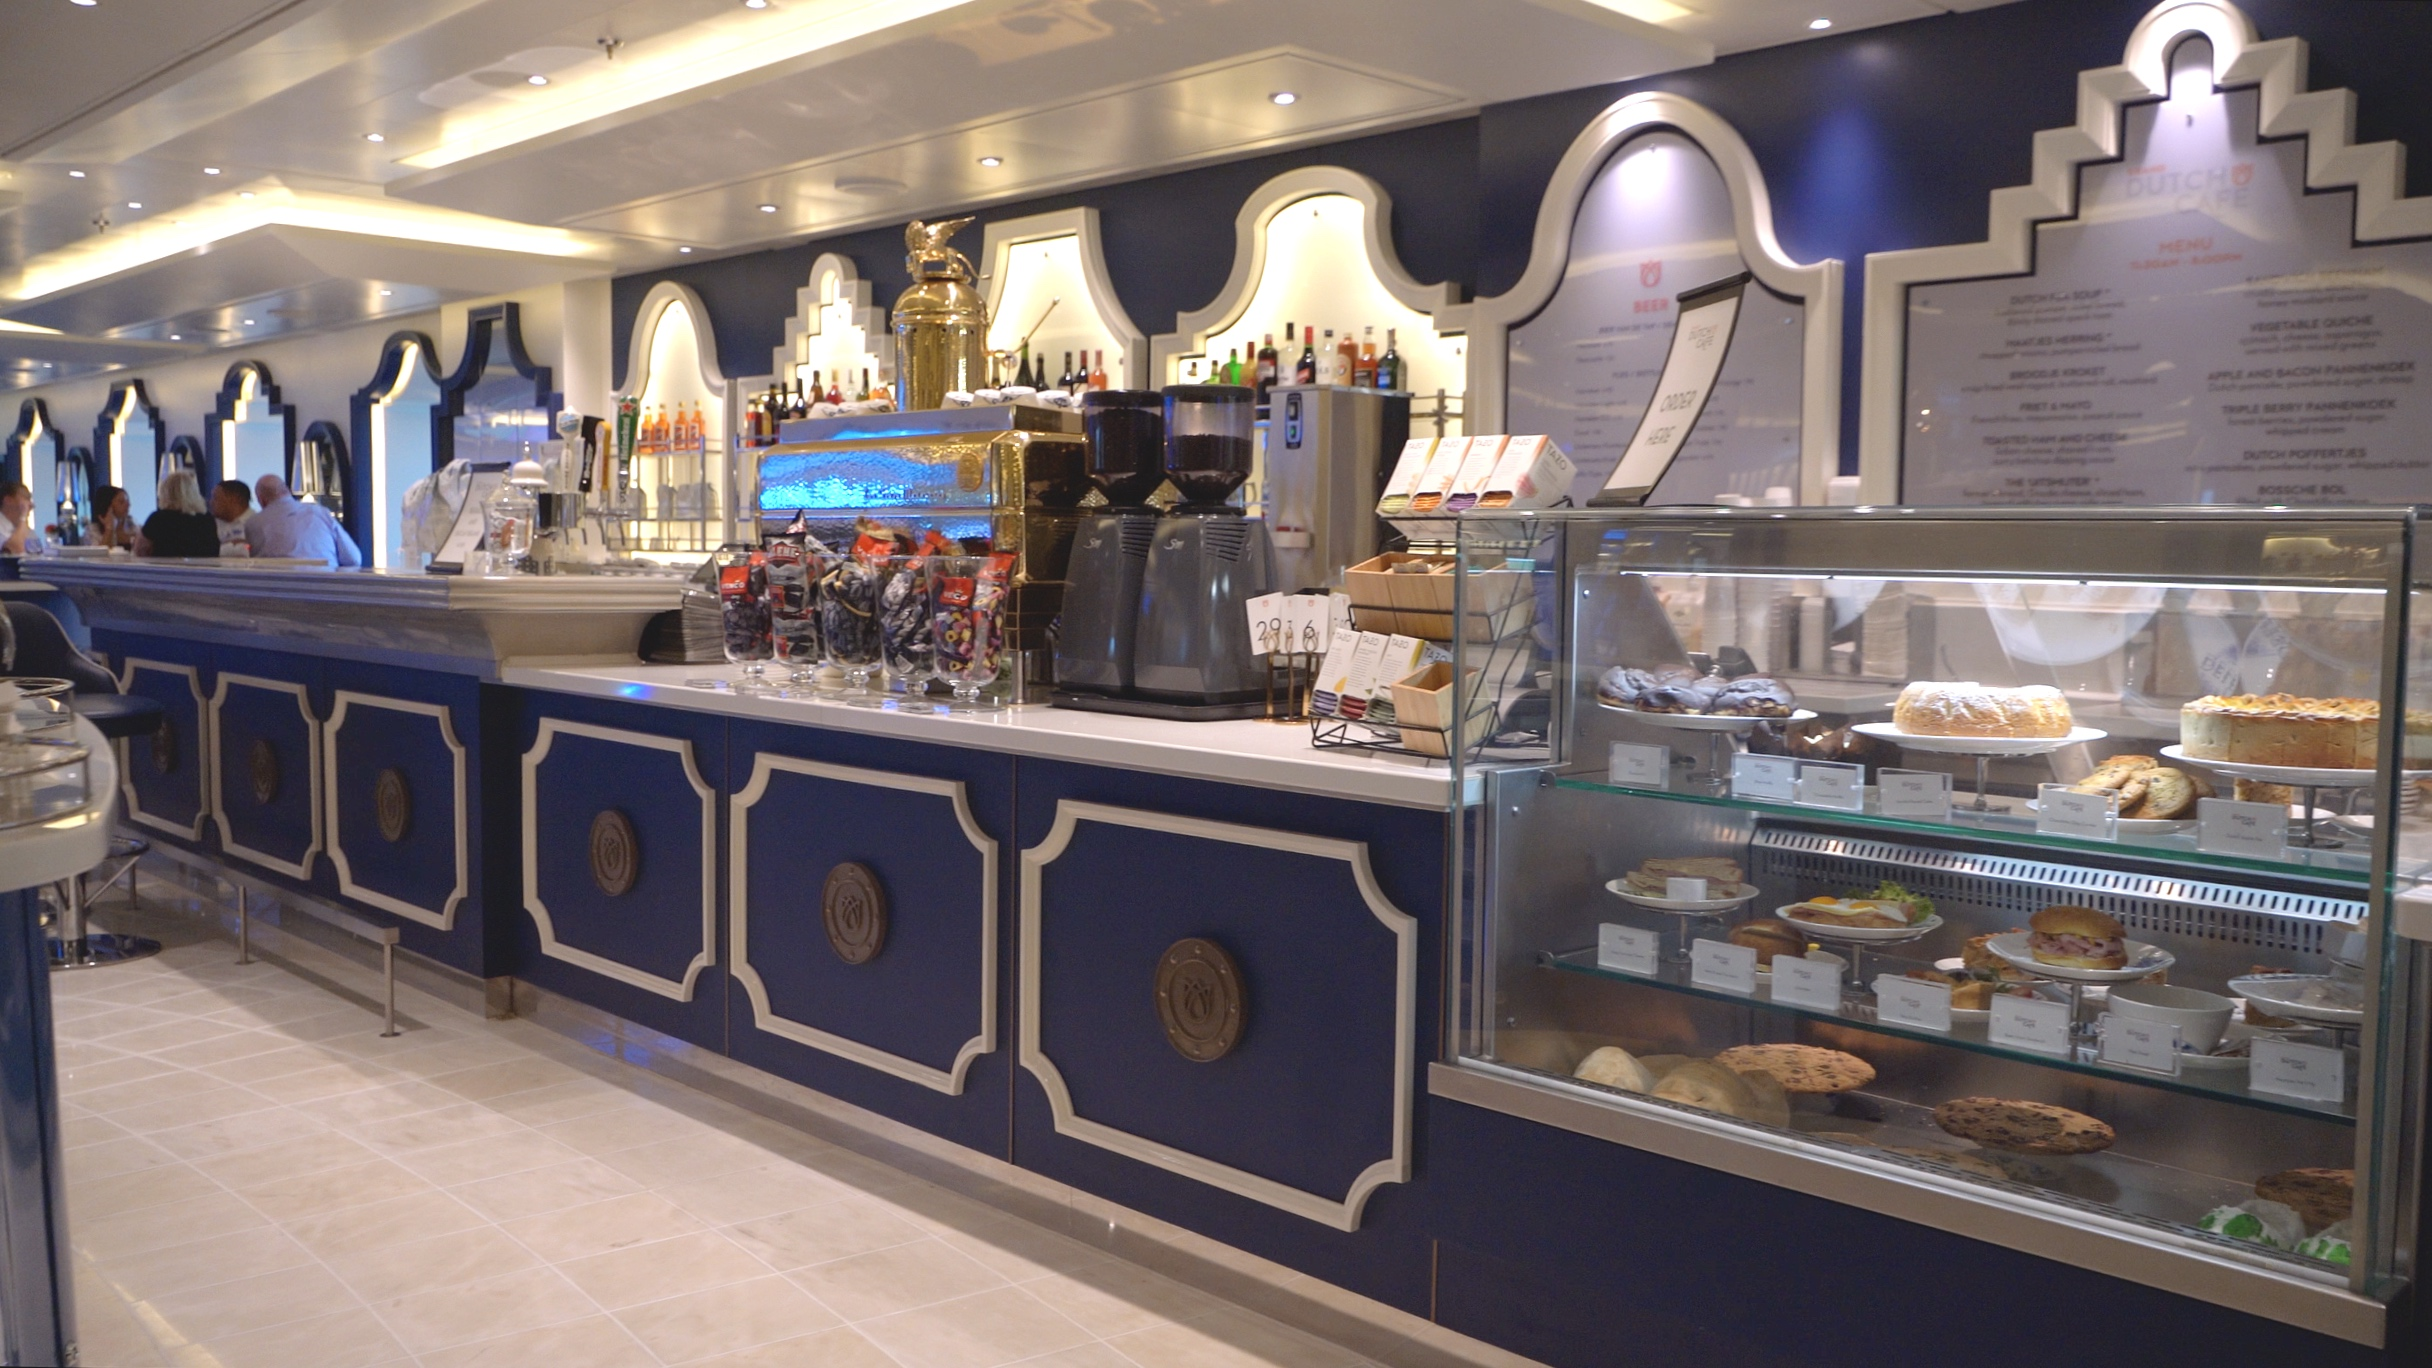 The Grand Cafe bar